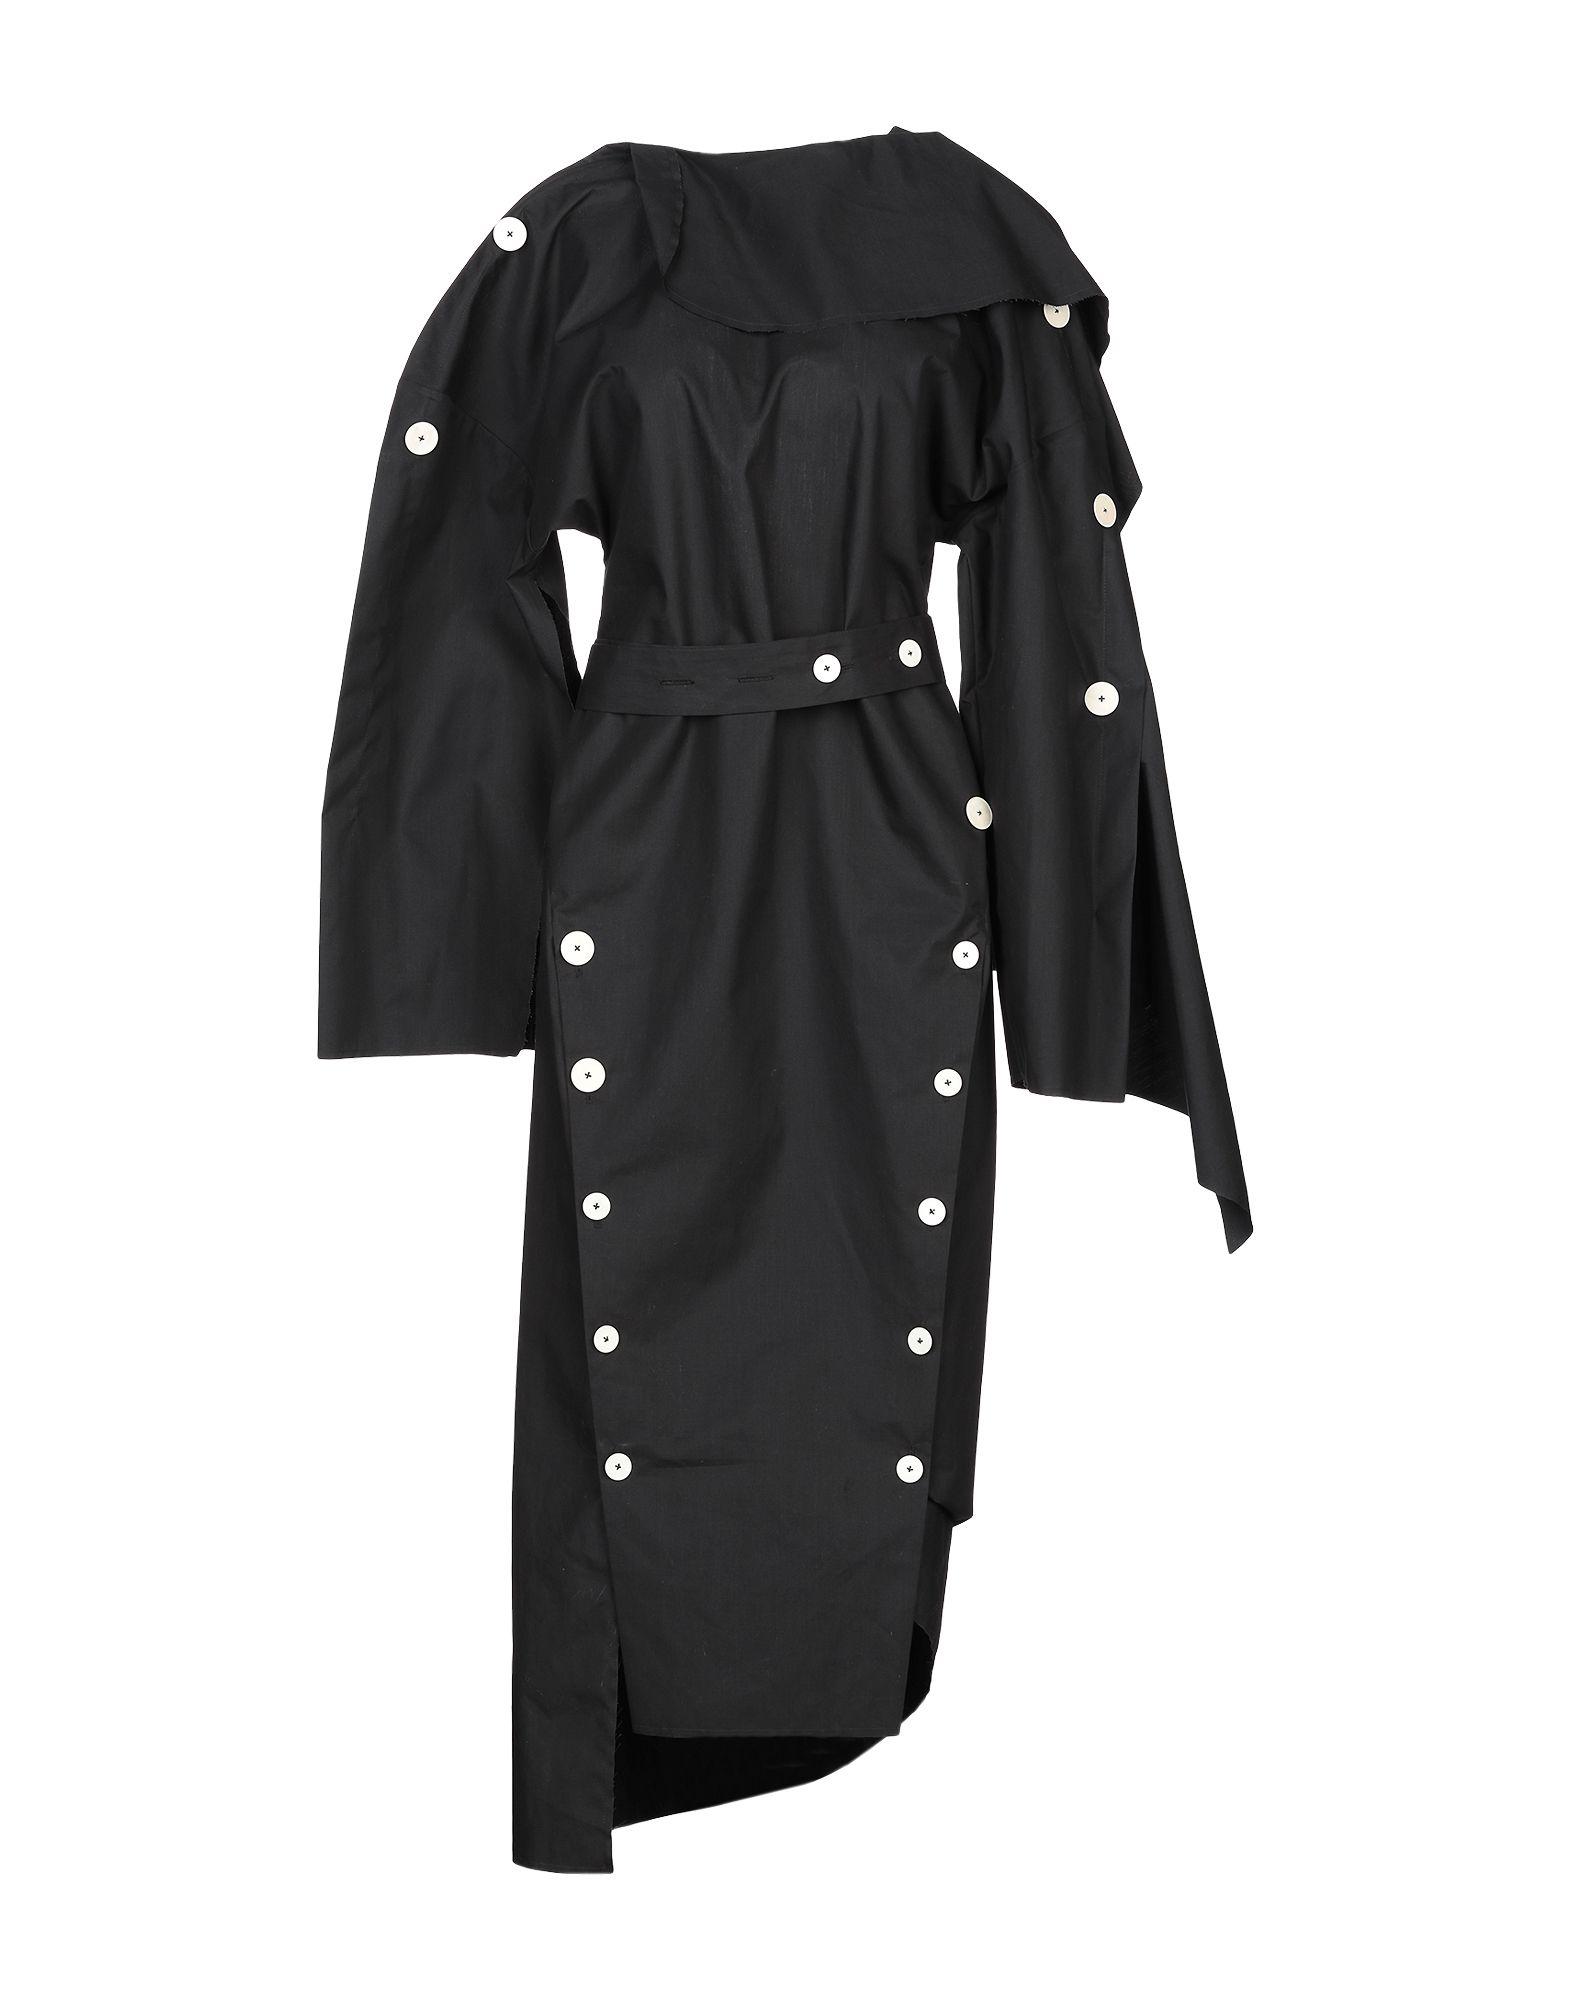 A.w.a.k.e. Dresses Midi Dress